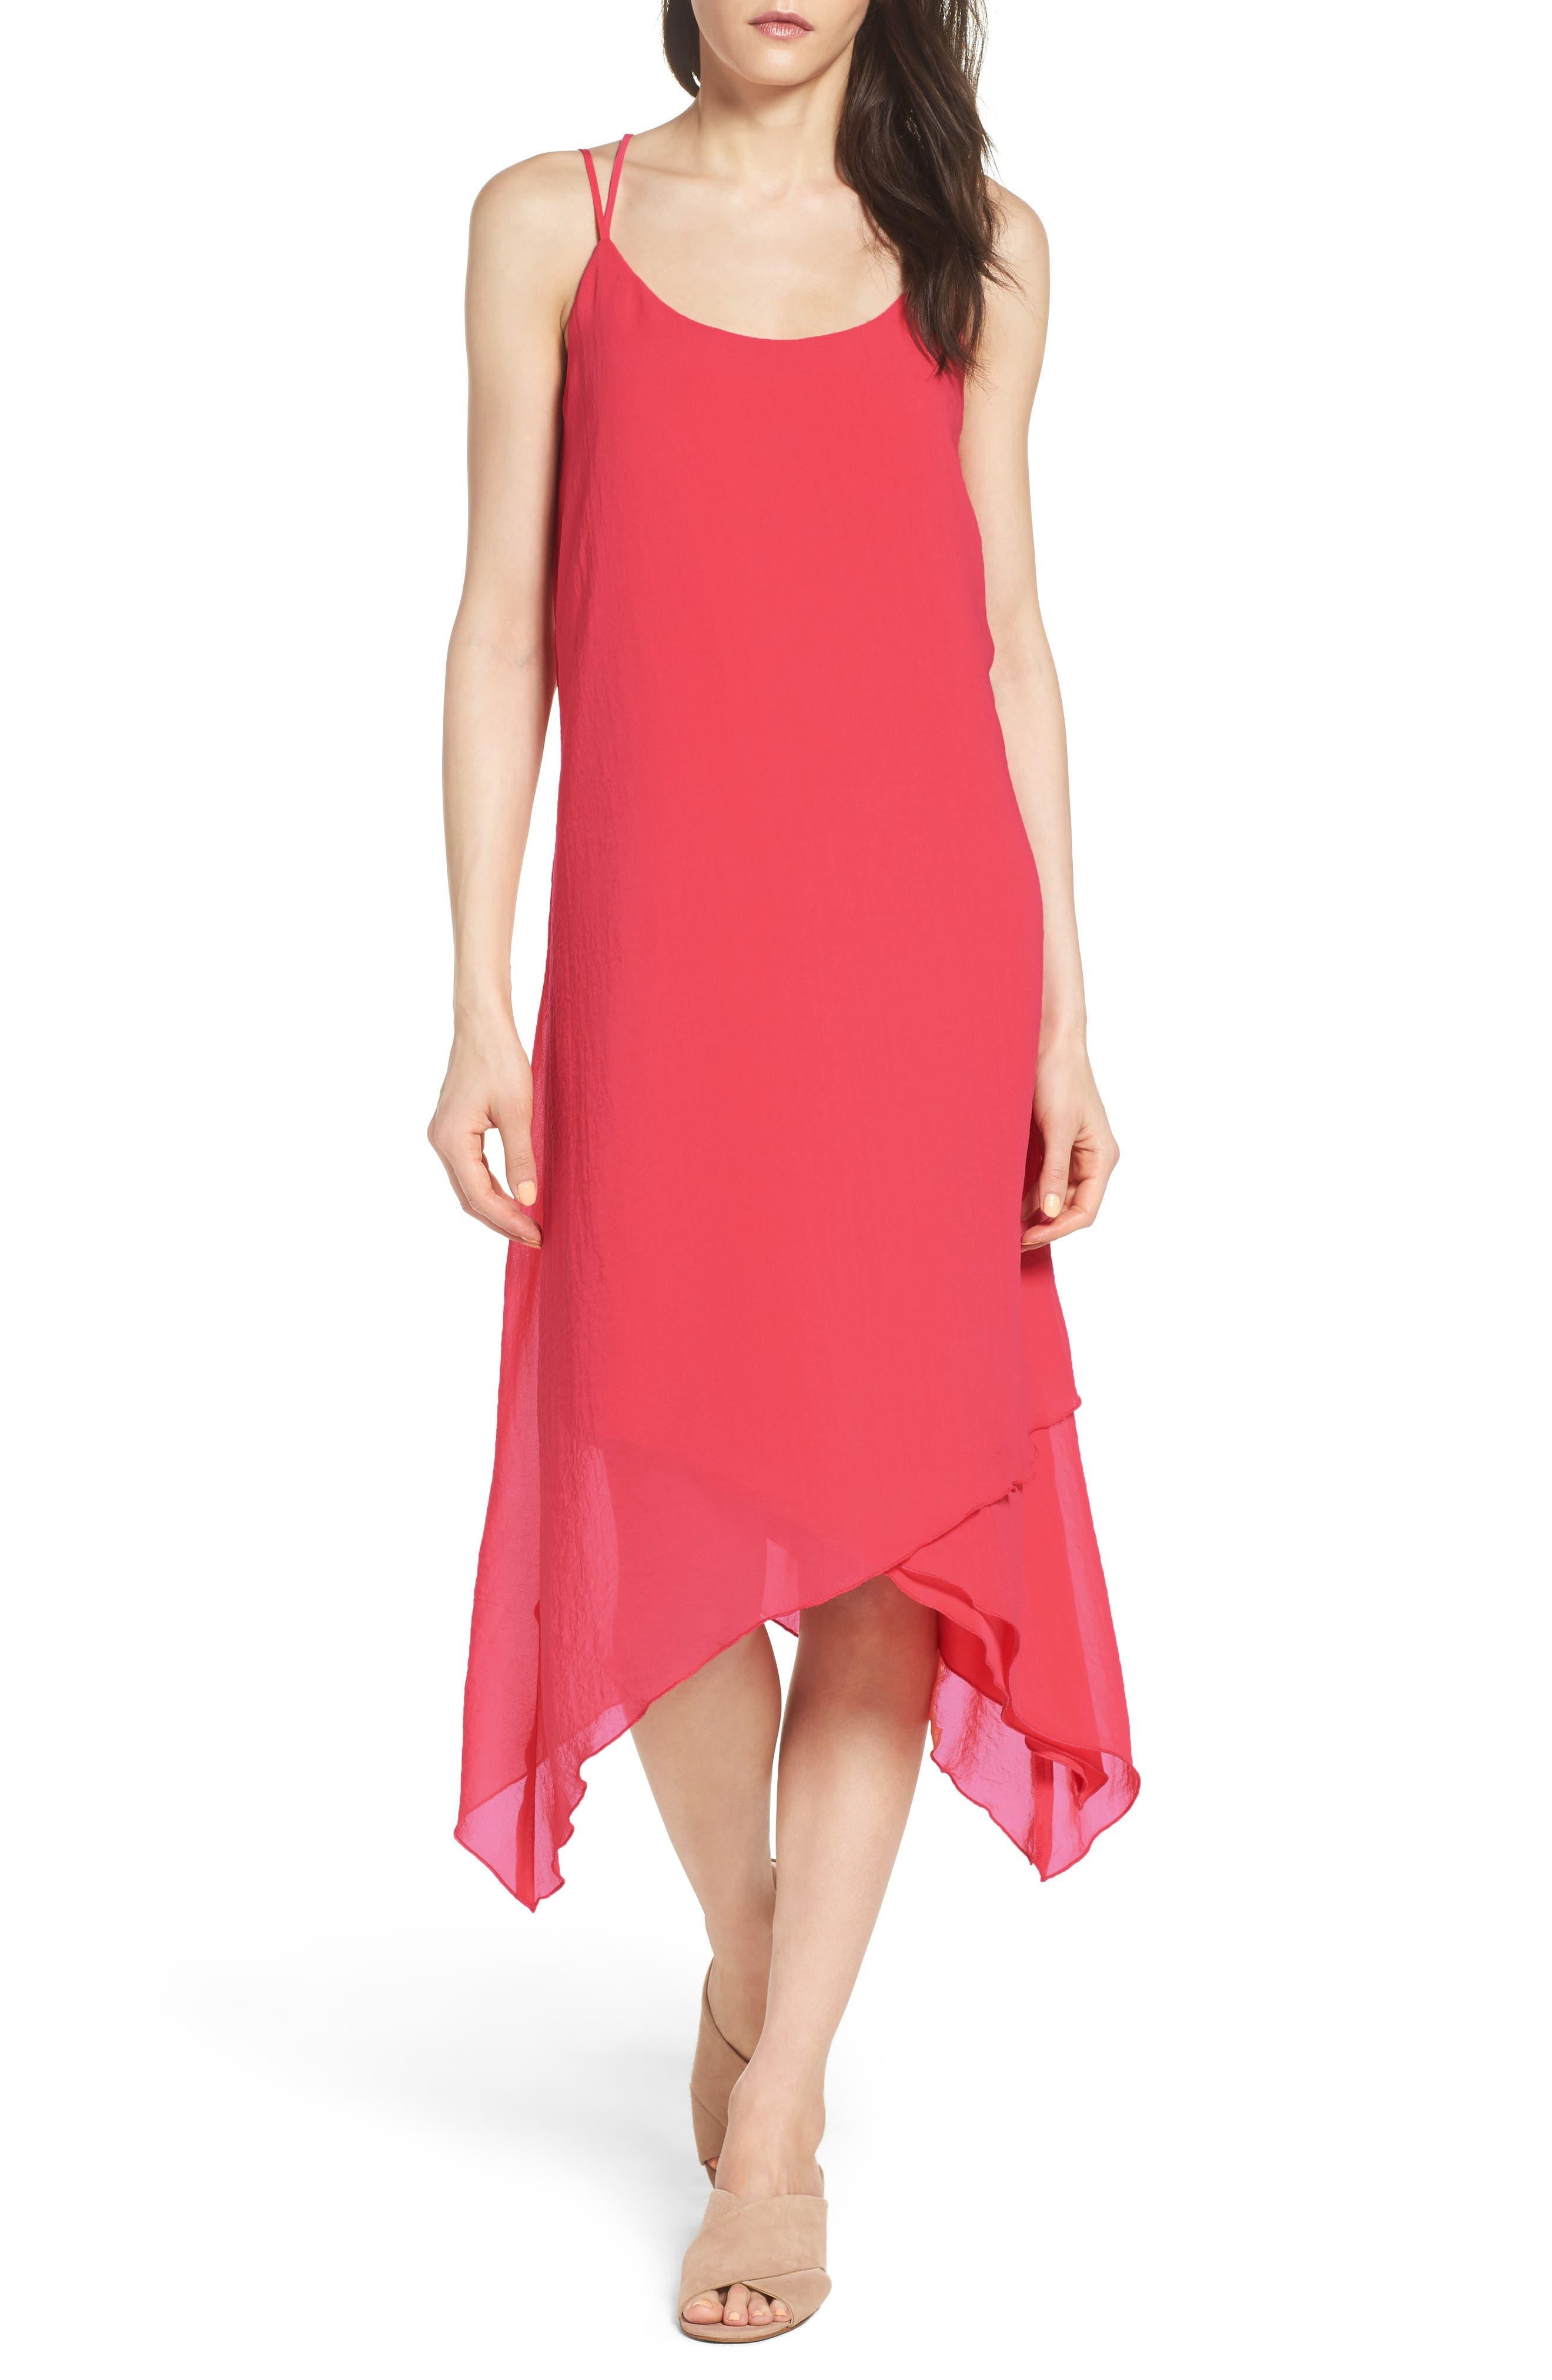 NSR Chiffon Midi Dress